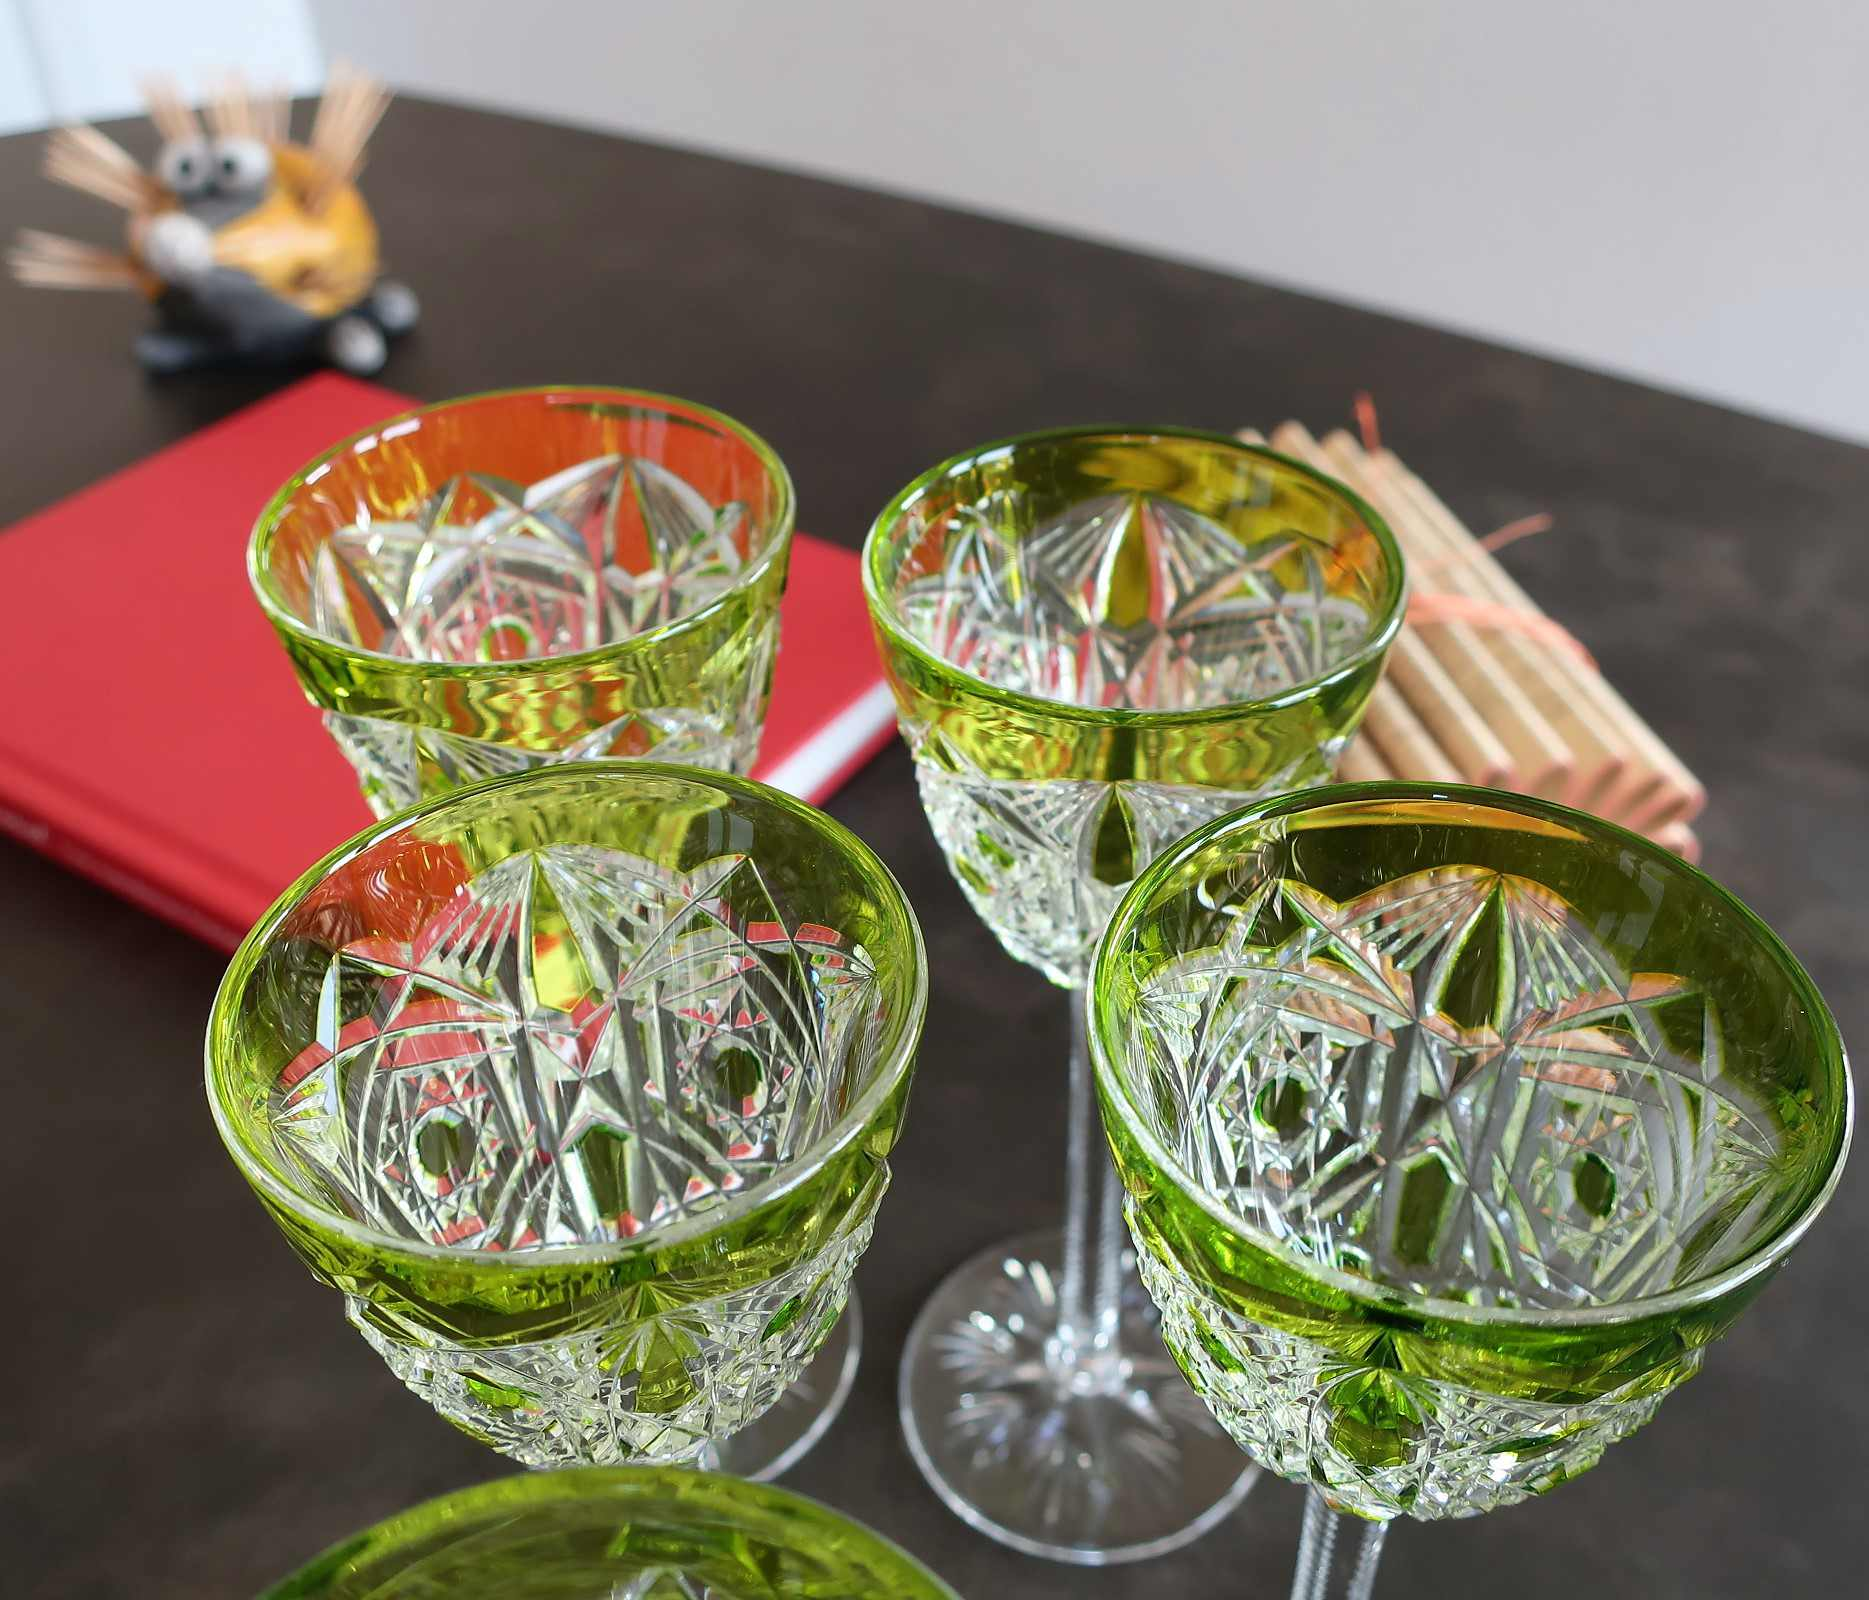 Roemer / Verre à vin du Rhin Lagny, cristal Baccarat